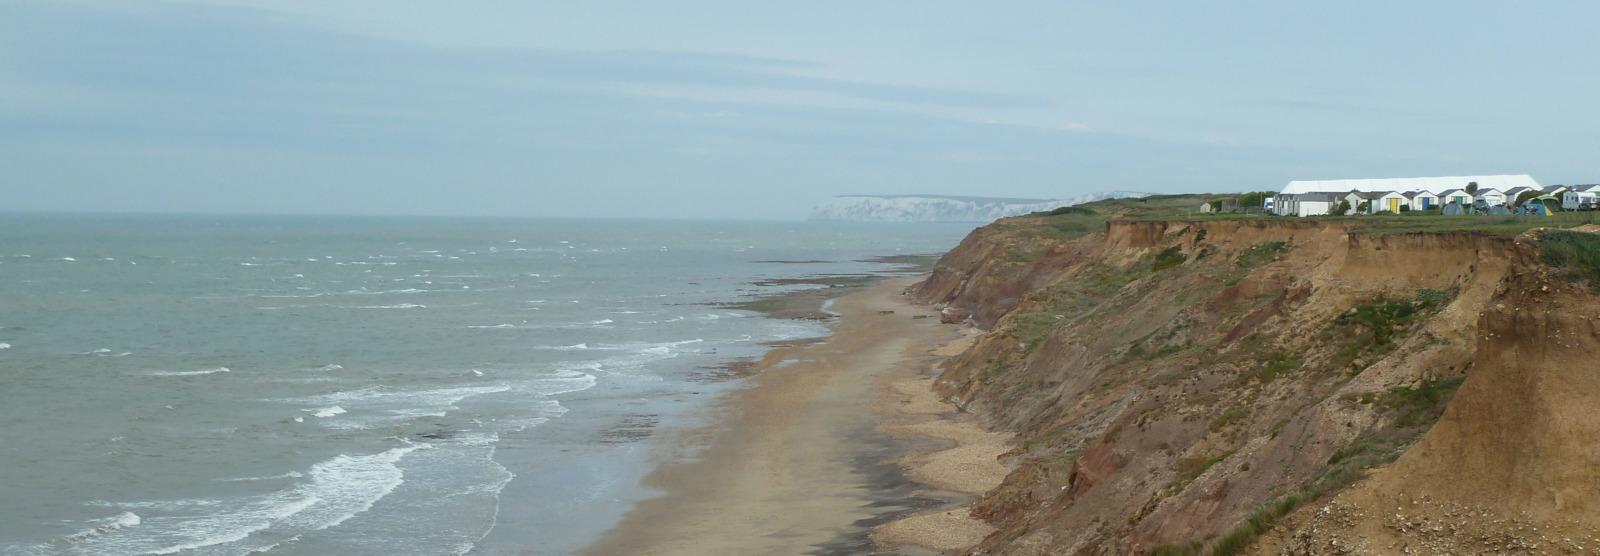 Brighstone Bay